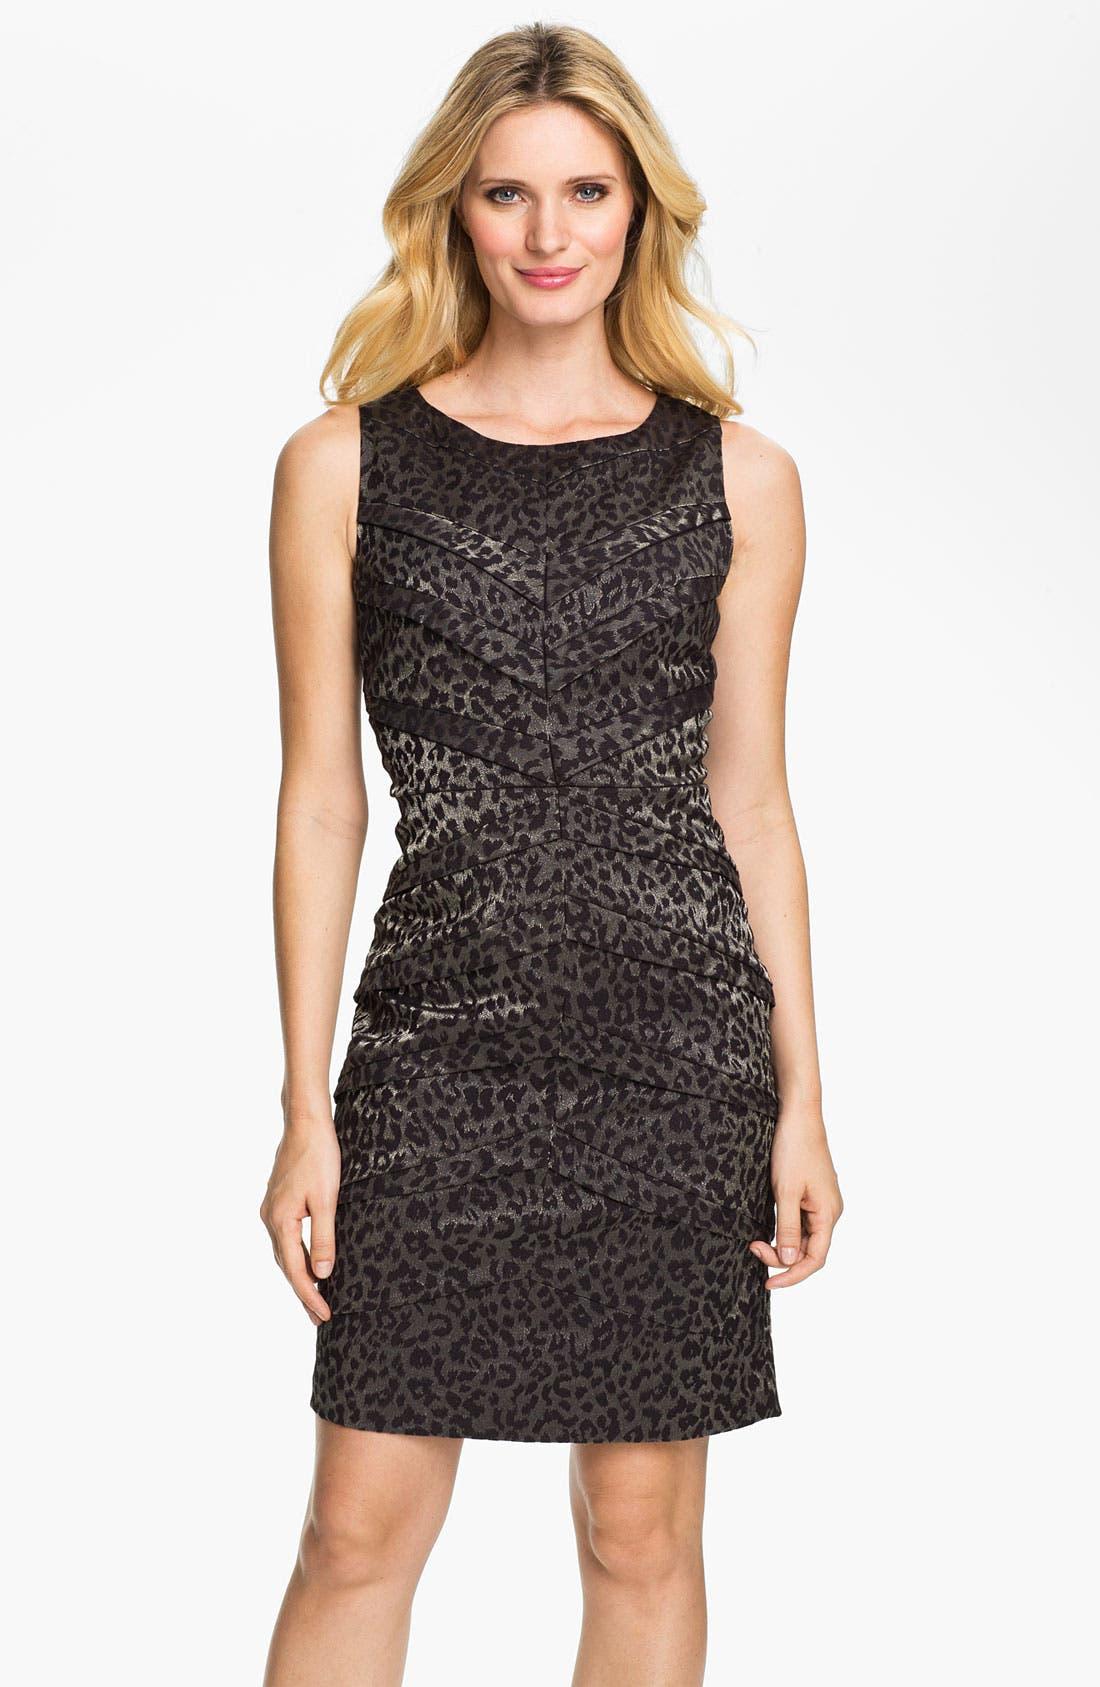 Alternate Image 1 Selected - Adrianna Papell Metallic Leopard Print Sheath Dress